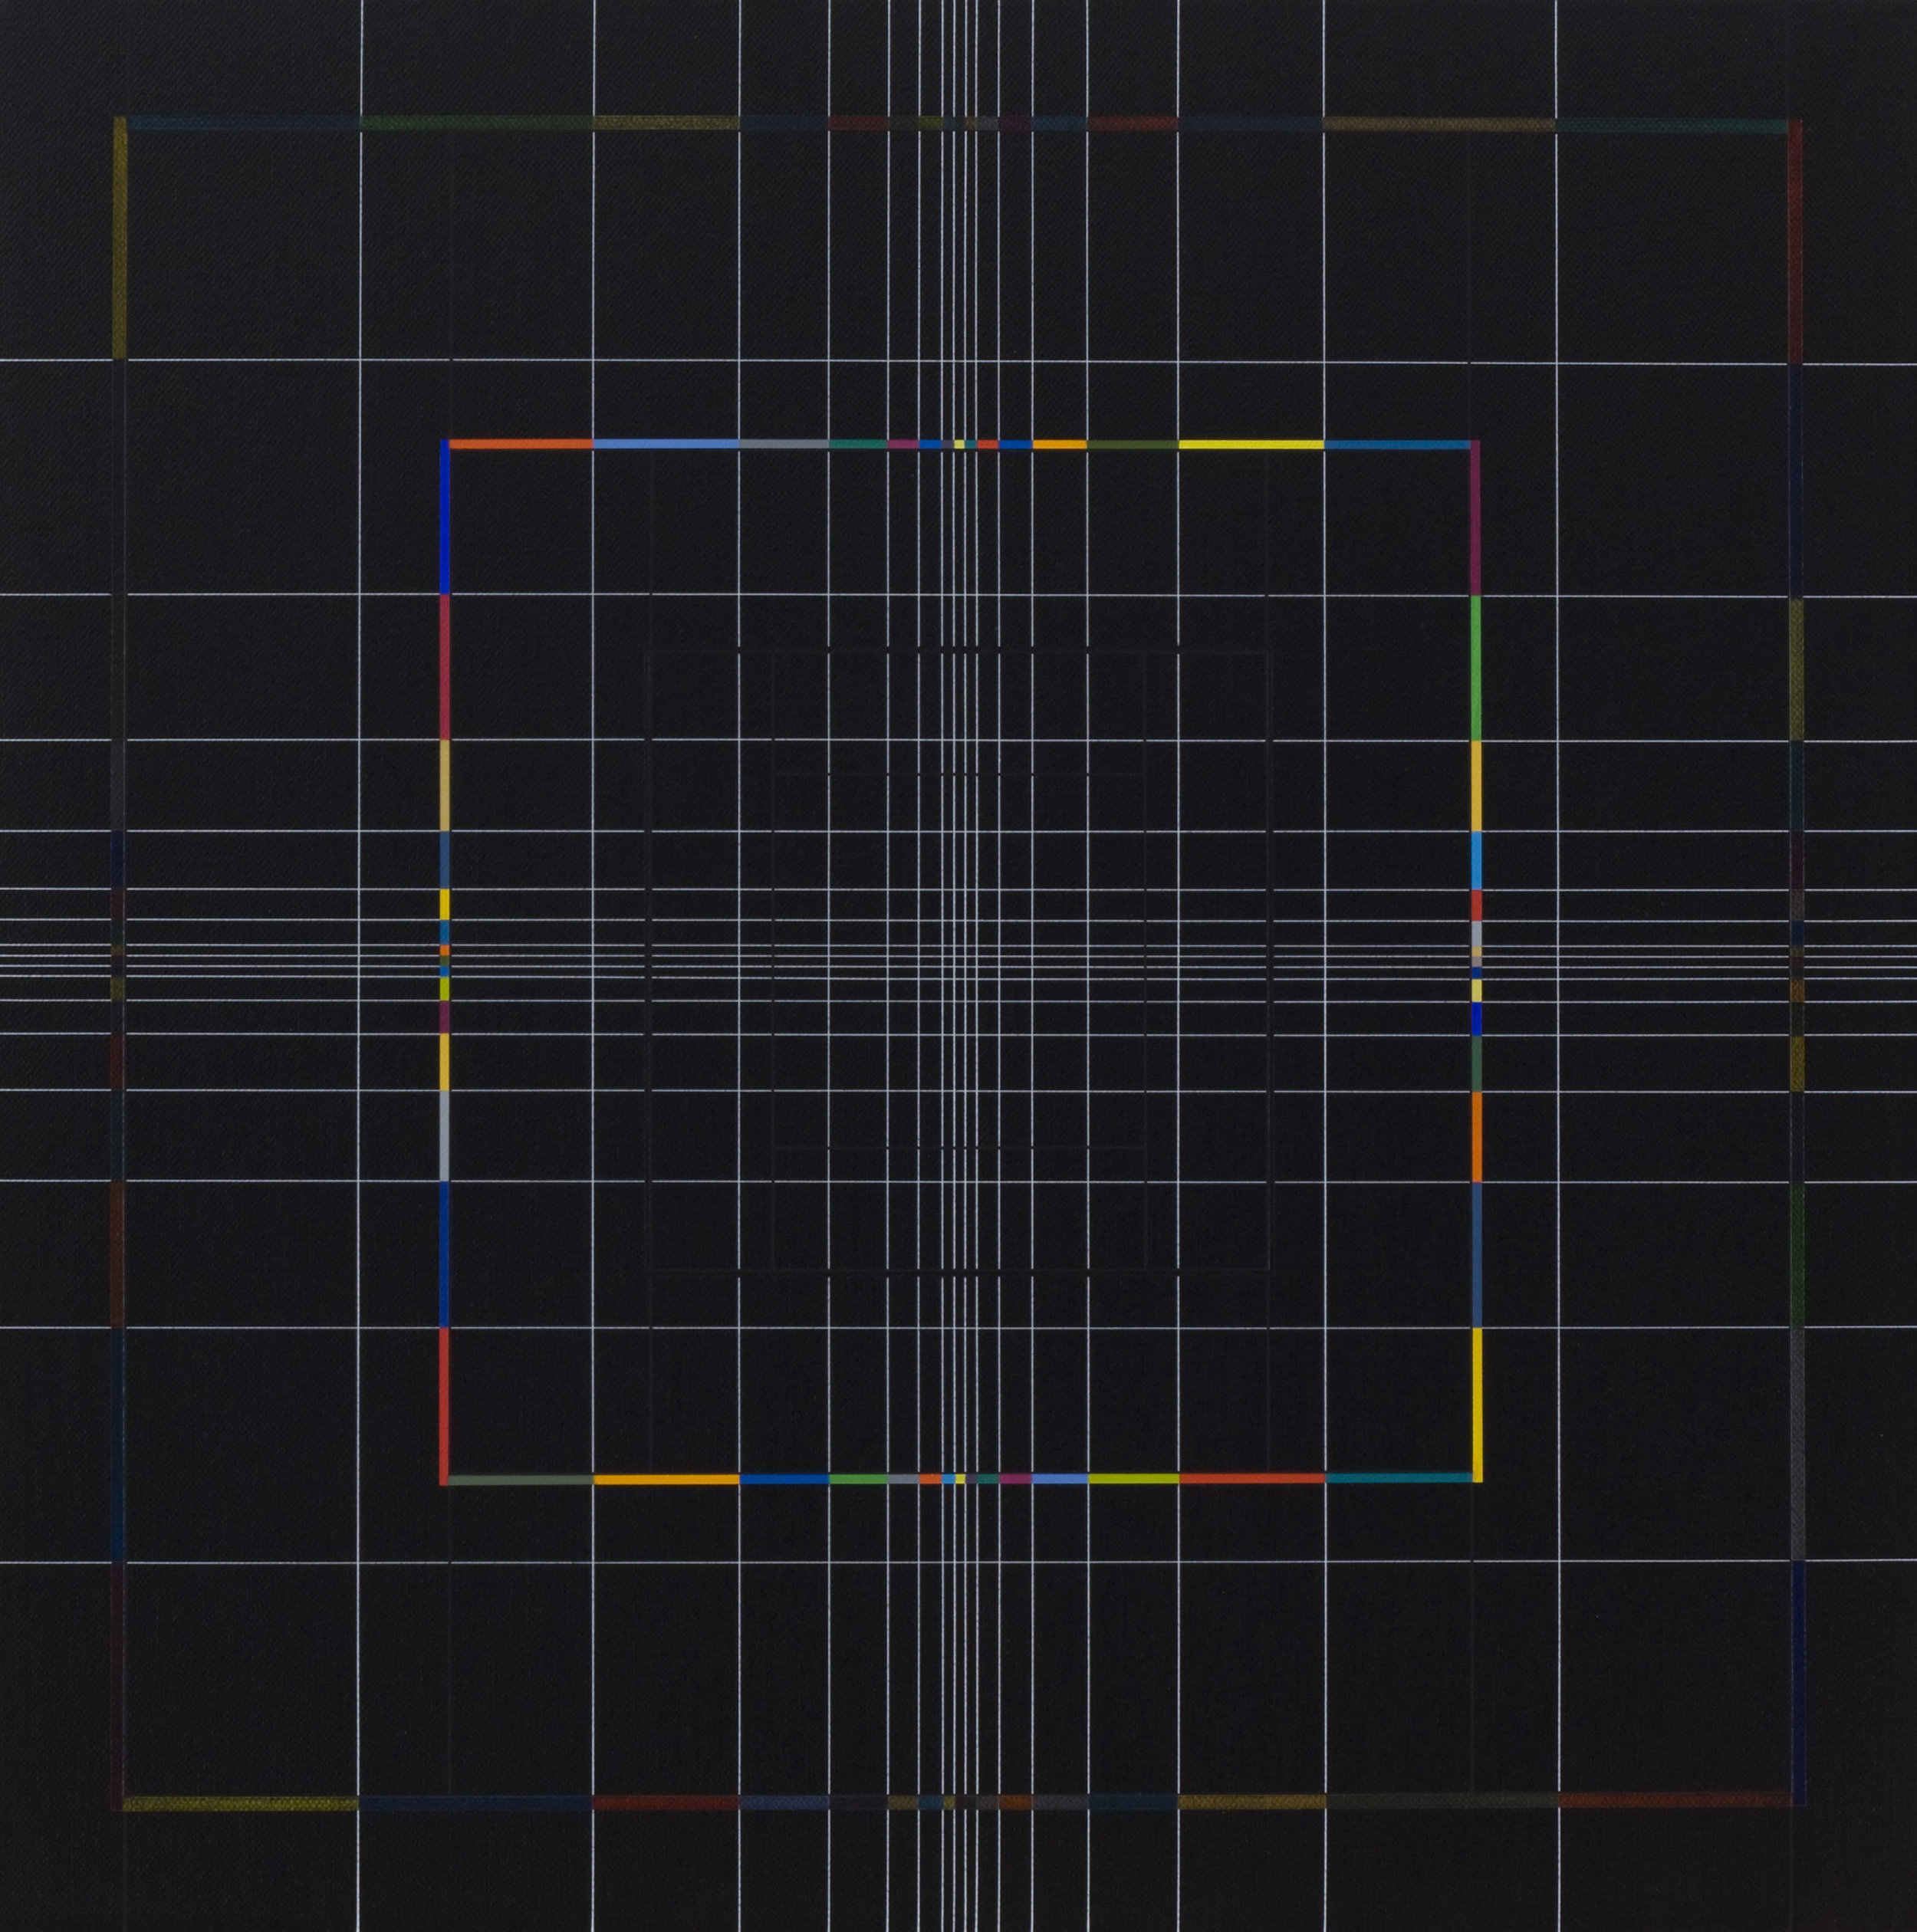 Yantra-ipsum(1)2013.Sep, acrylic on canvas, 17 3/4 x 17 3/4 in. [45x45cm]